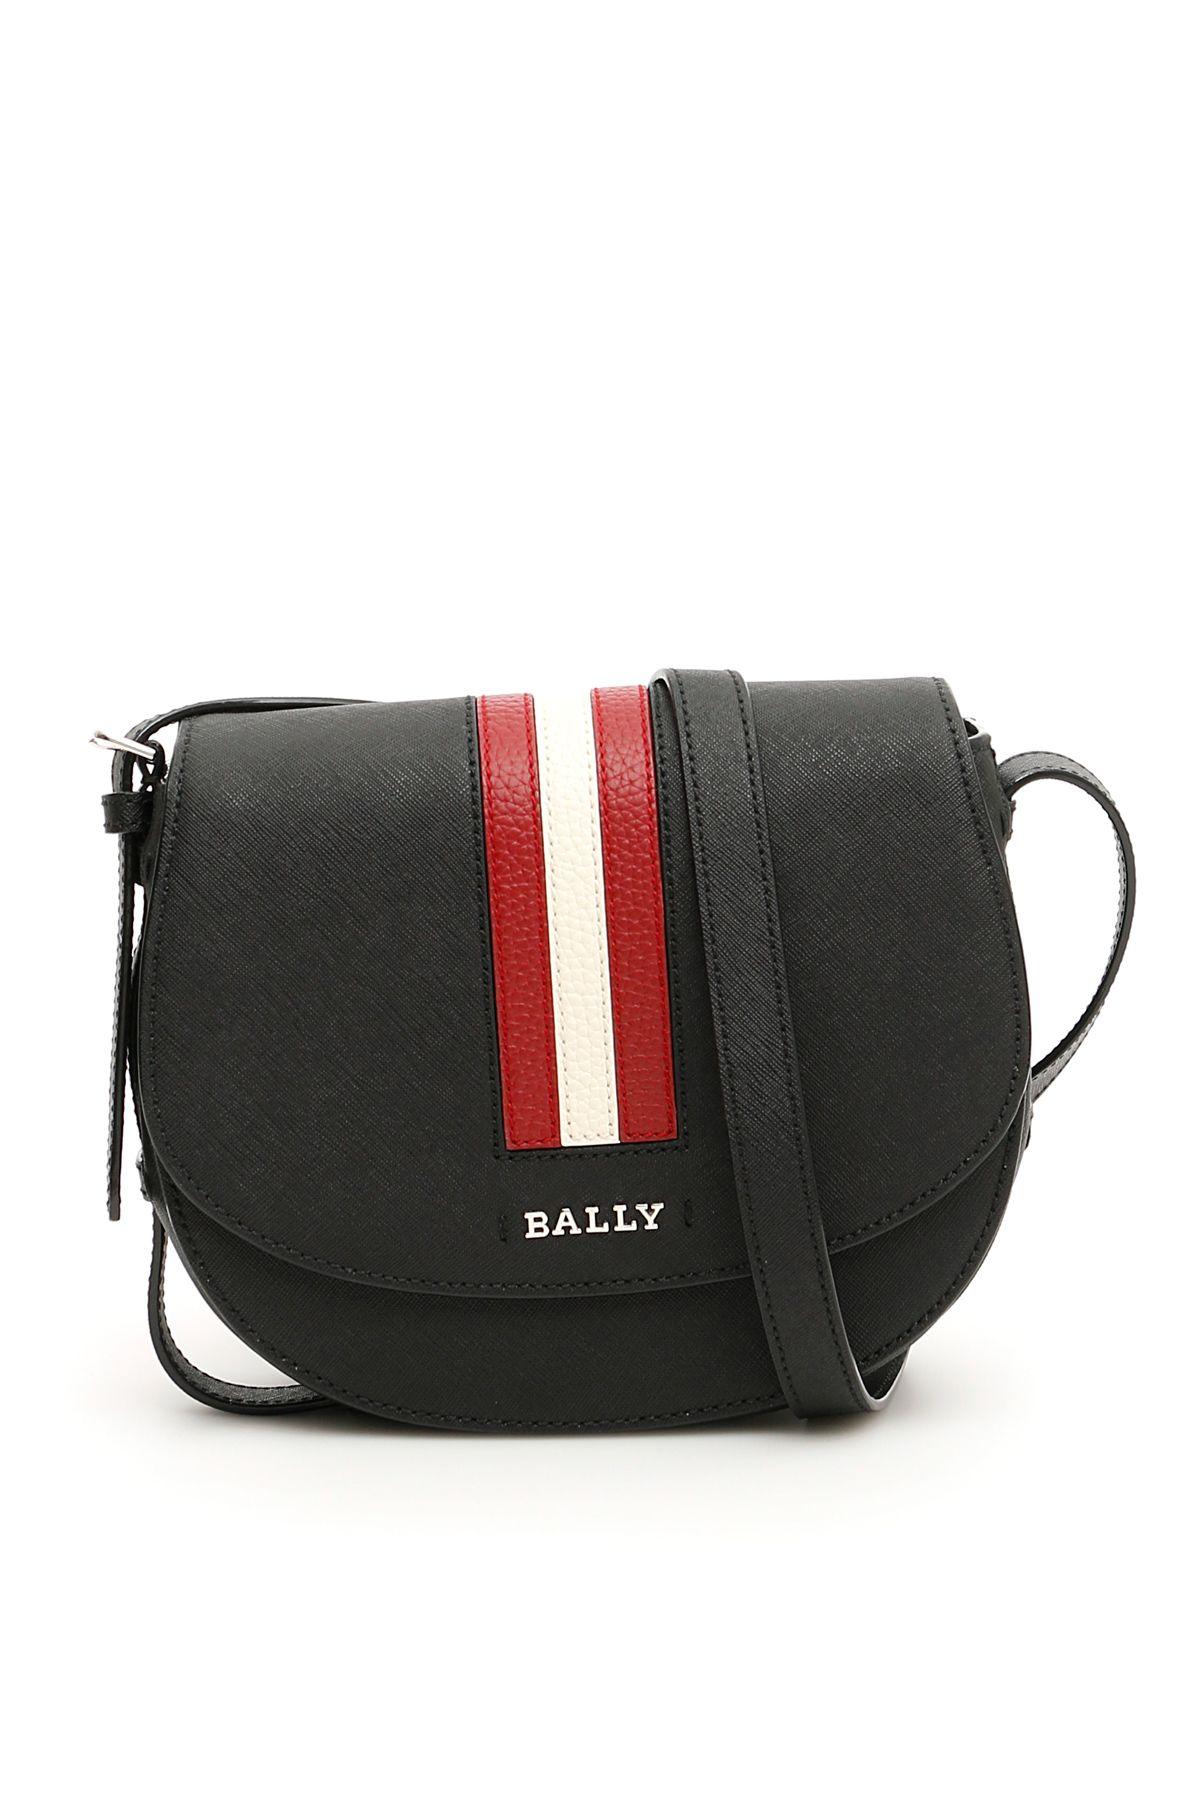 BALLY SUPRA MEDIUM CROSSBODY BAG